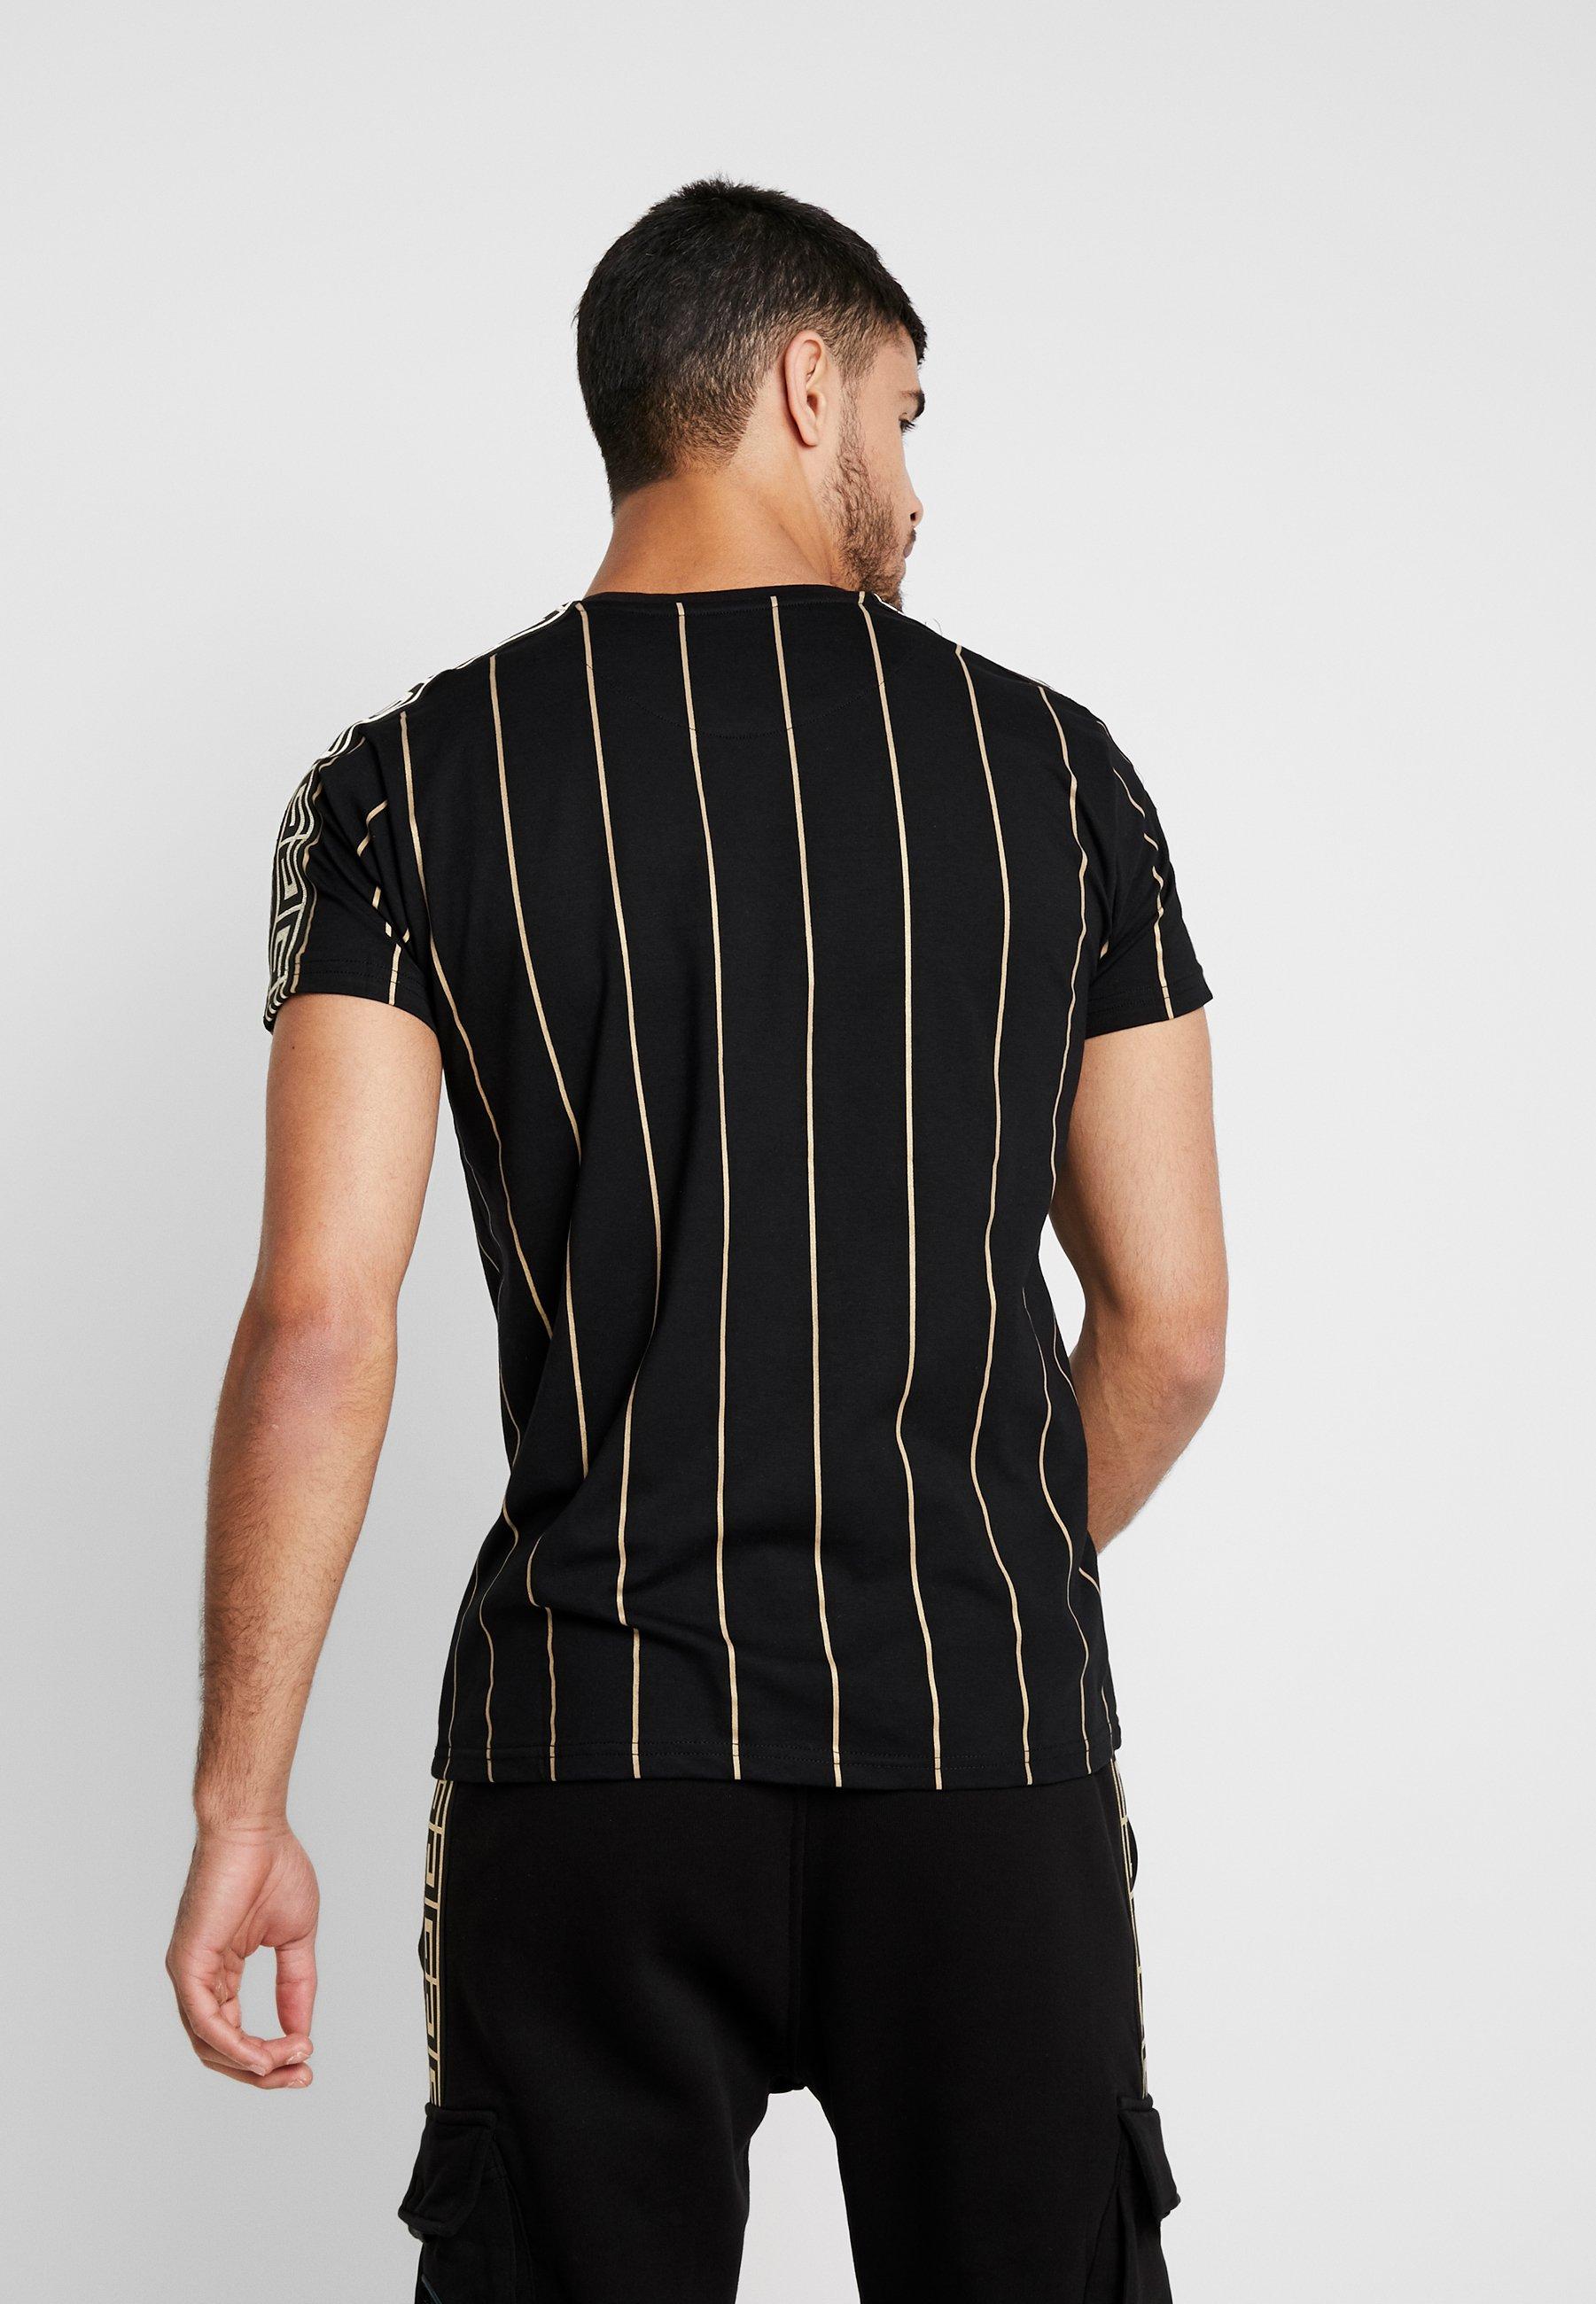 DerbanT Imprimé Black Glorious shirt Gangsta nwm8OyvN0